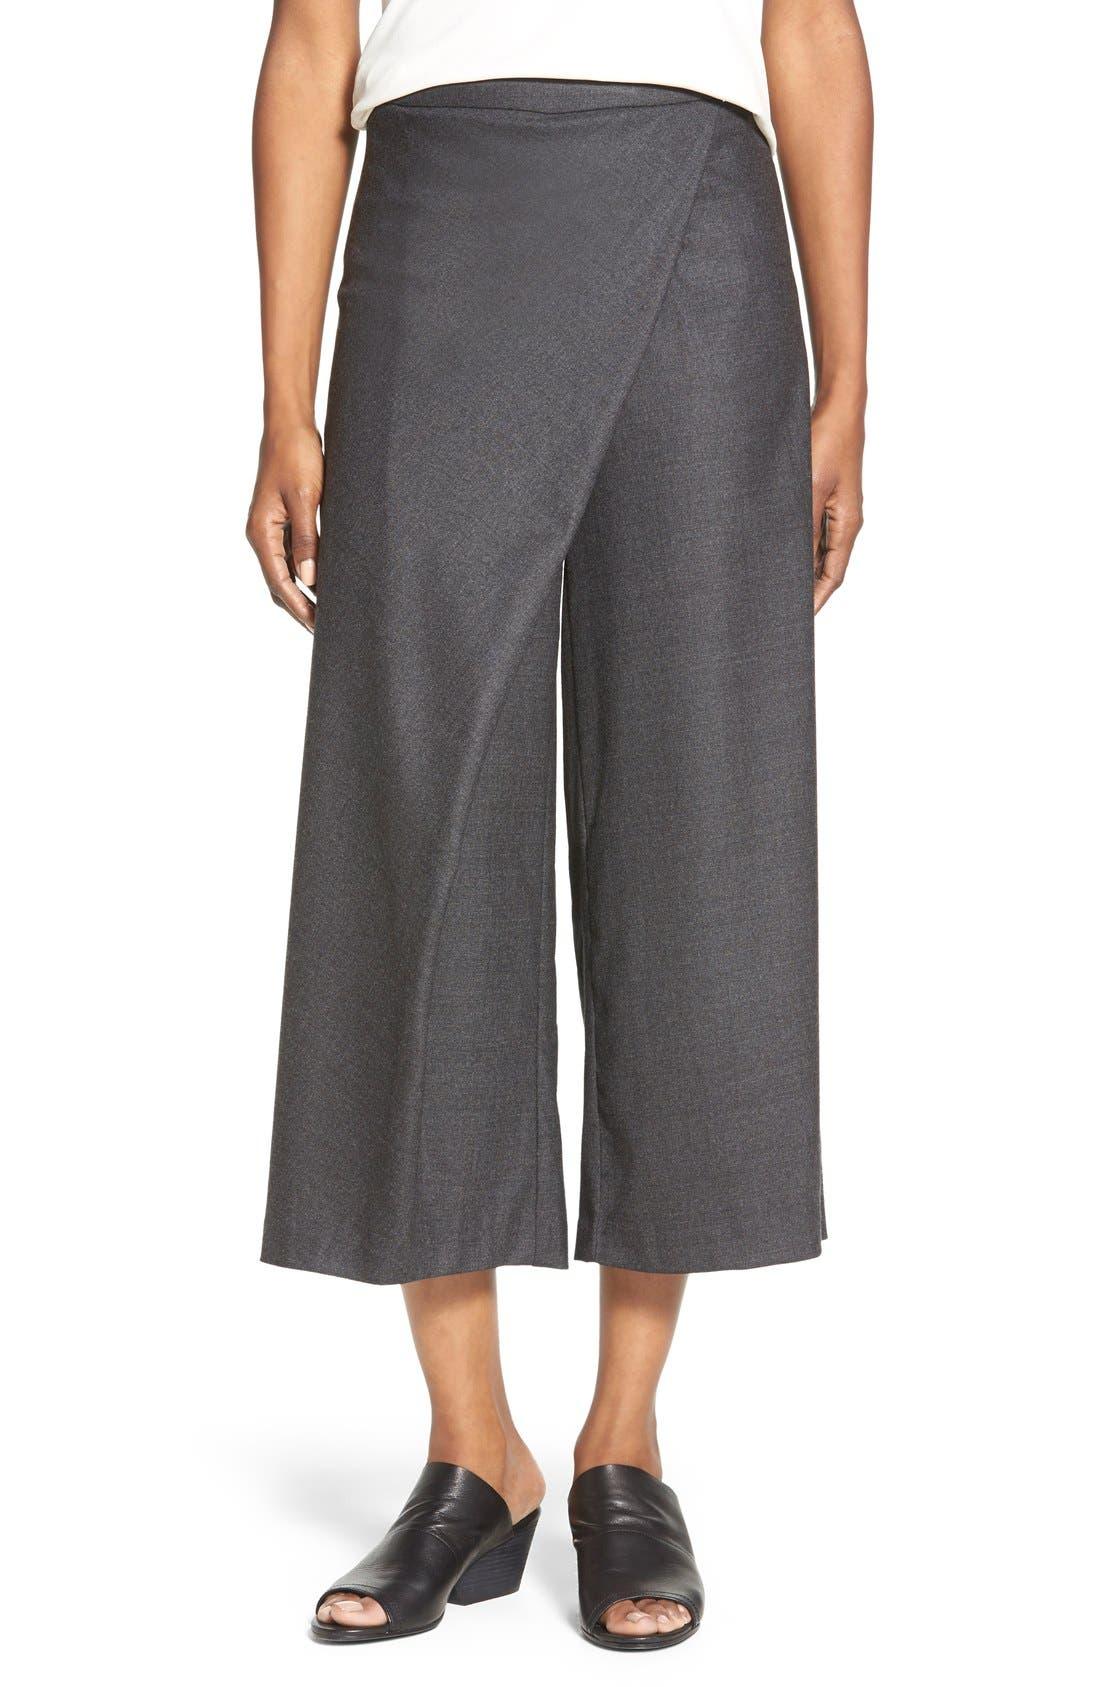 Main Image - Eileen Fisher Wool Twill Sarong Pants  (Regular & Petite)